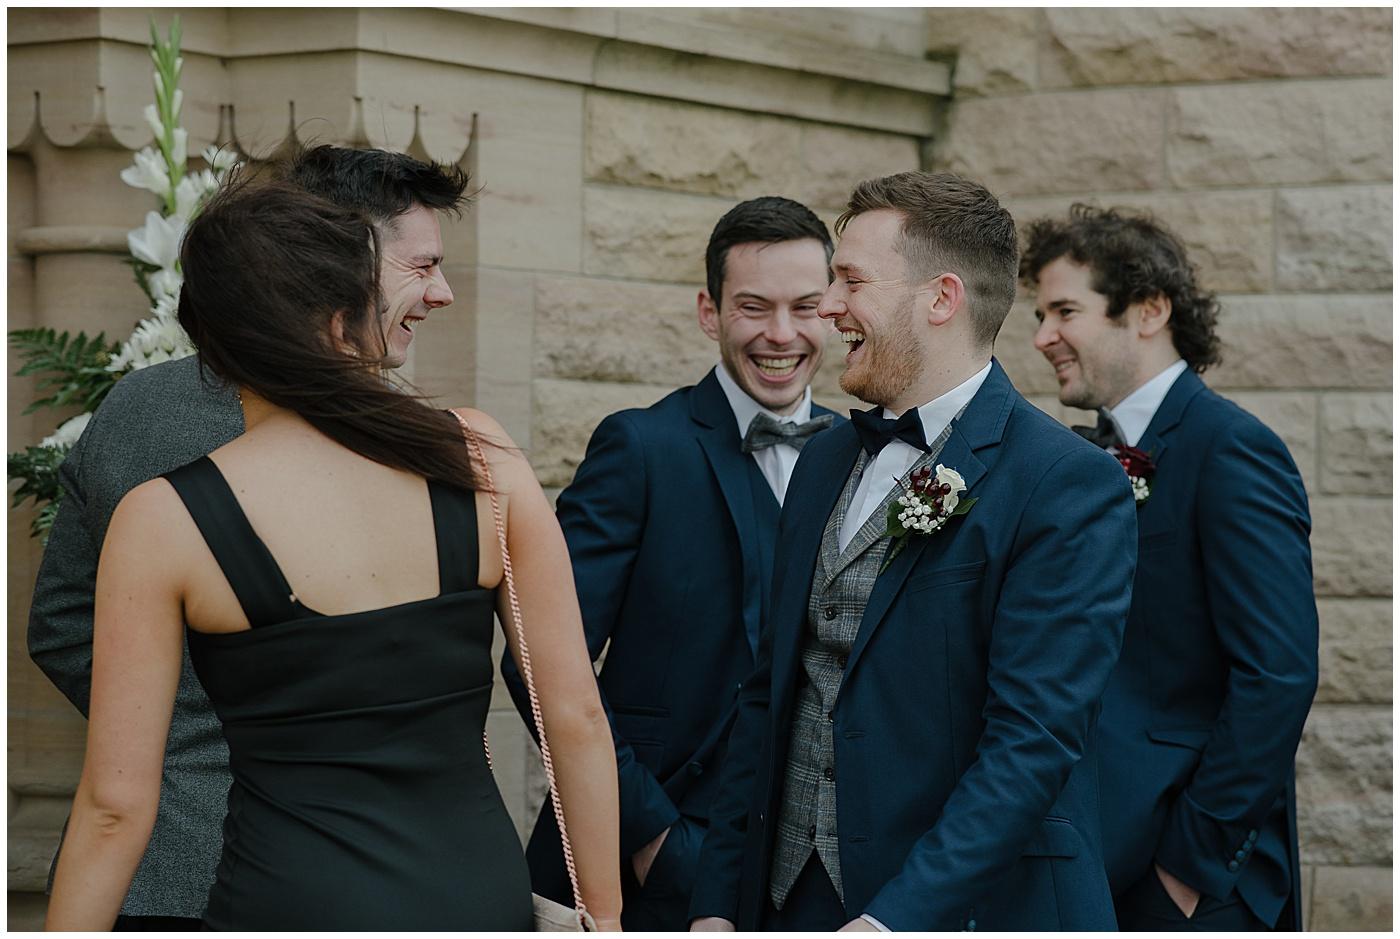 lissan-house-wedding-jude-browne-photography_0024.jpg